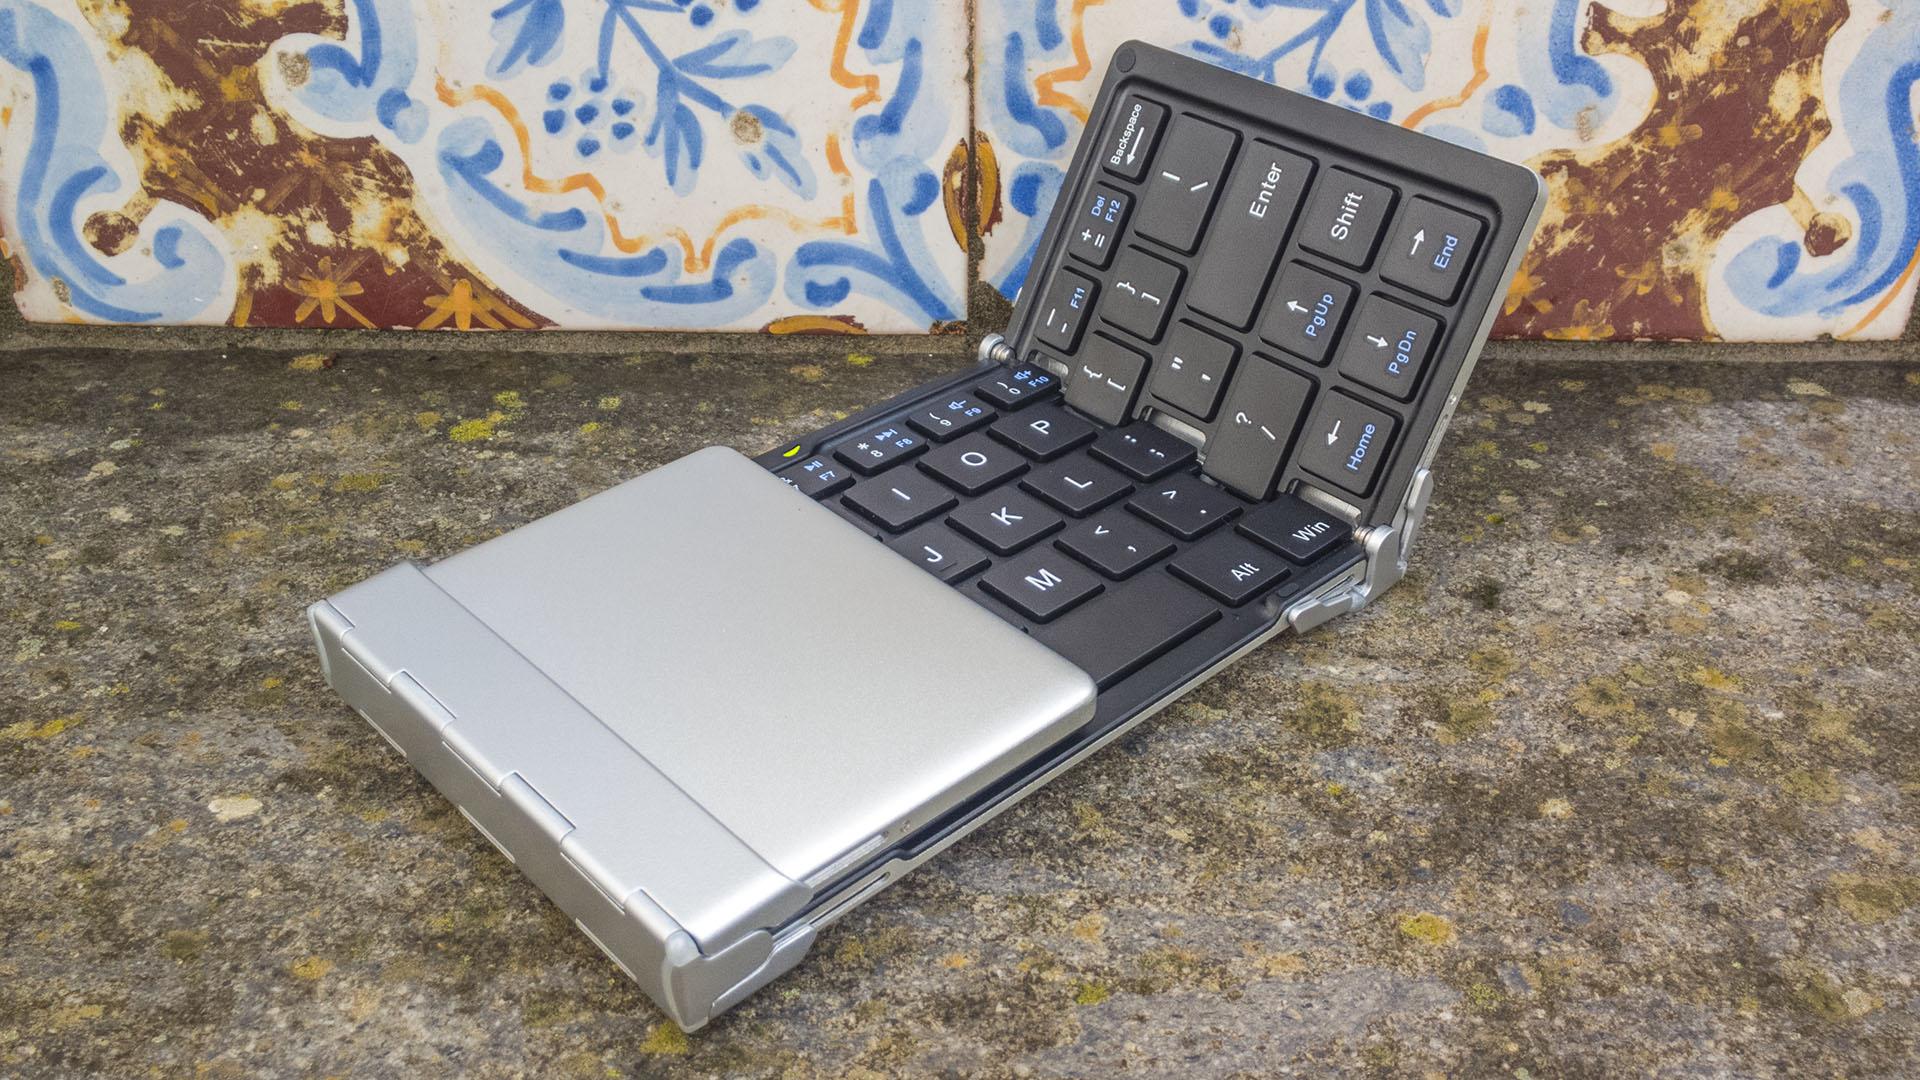 Tastiera Bluetooth iClever per Windows, iOS, Android (6)